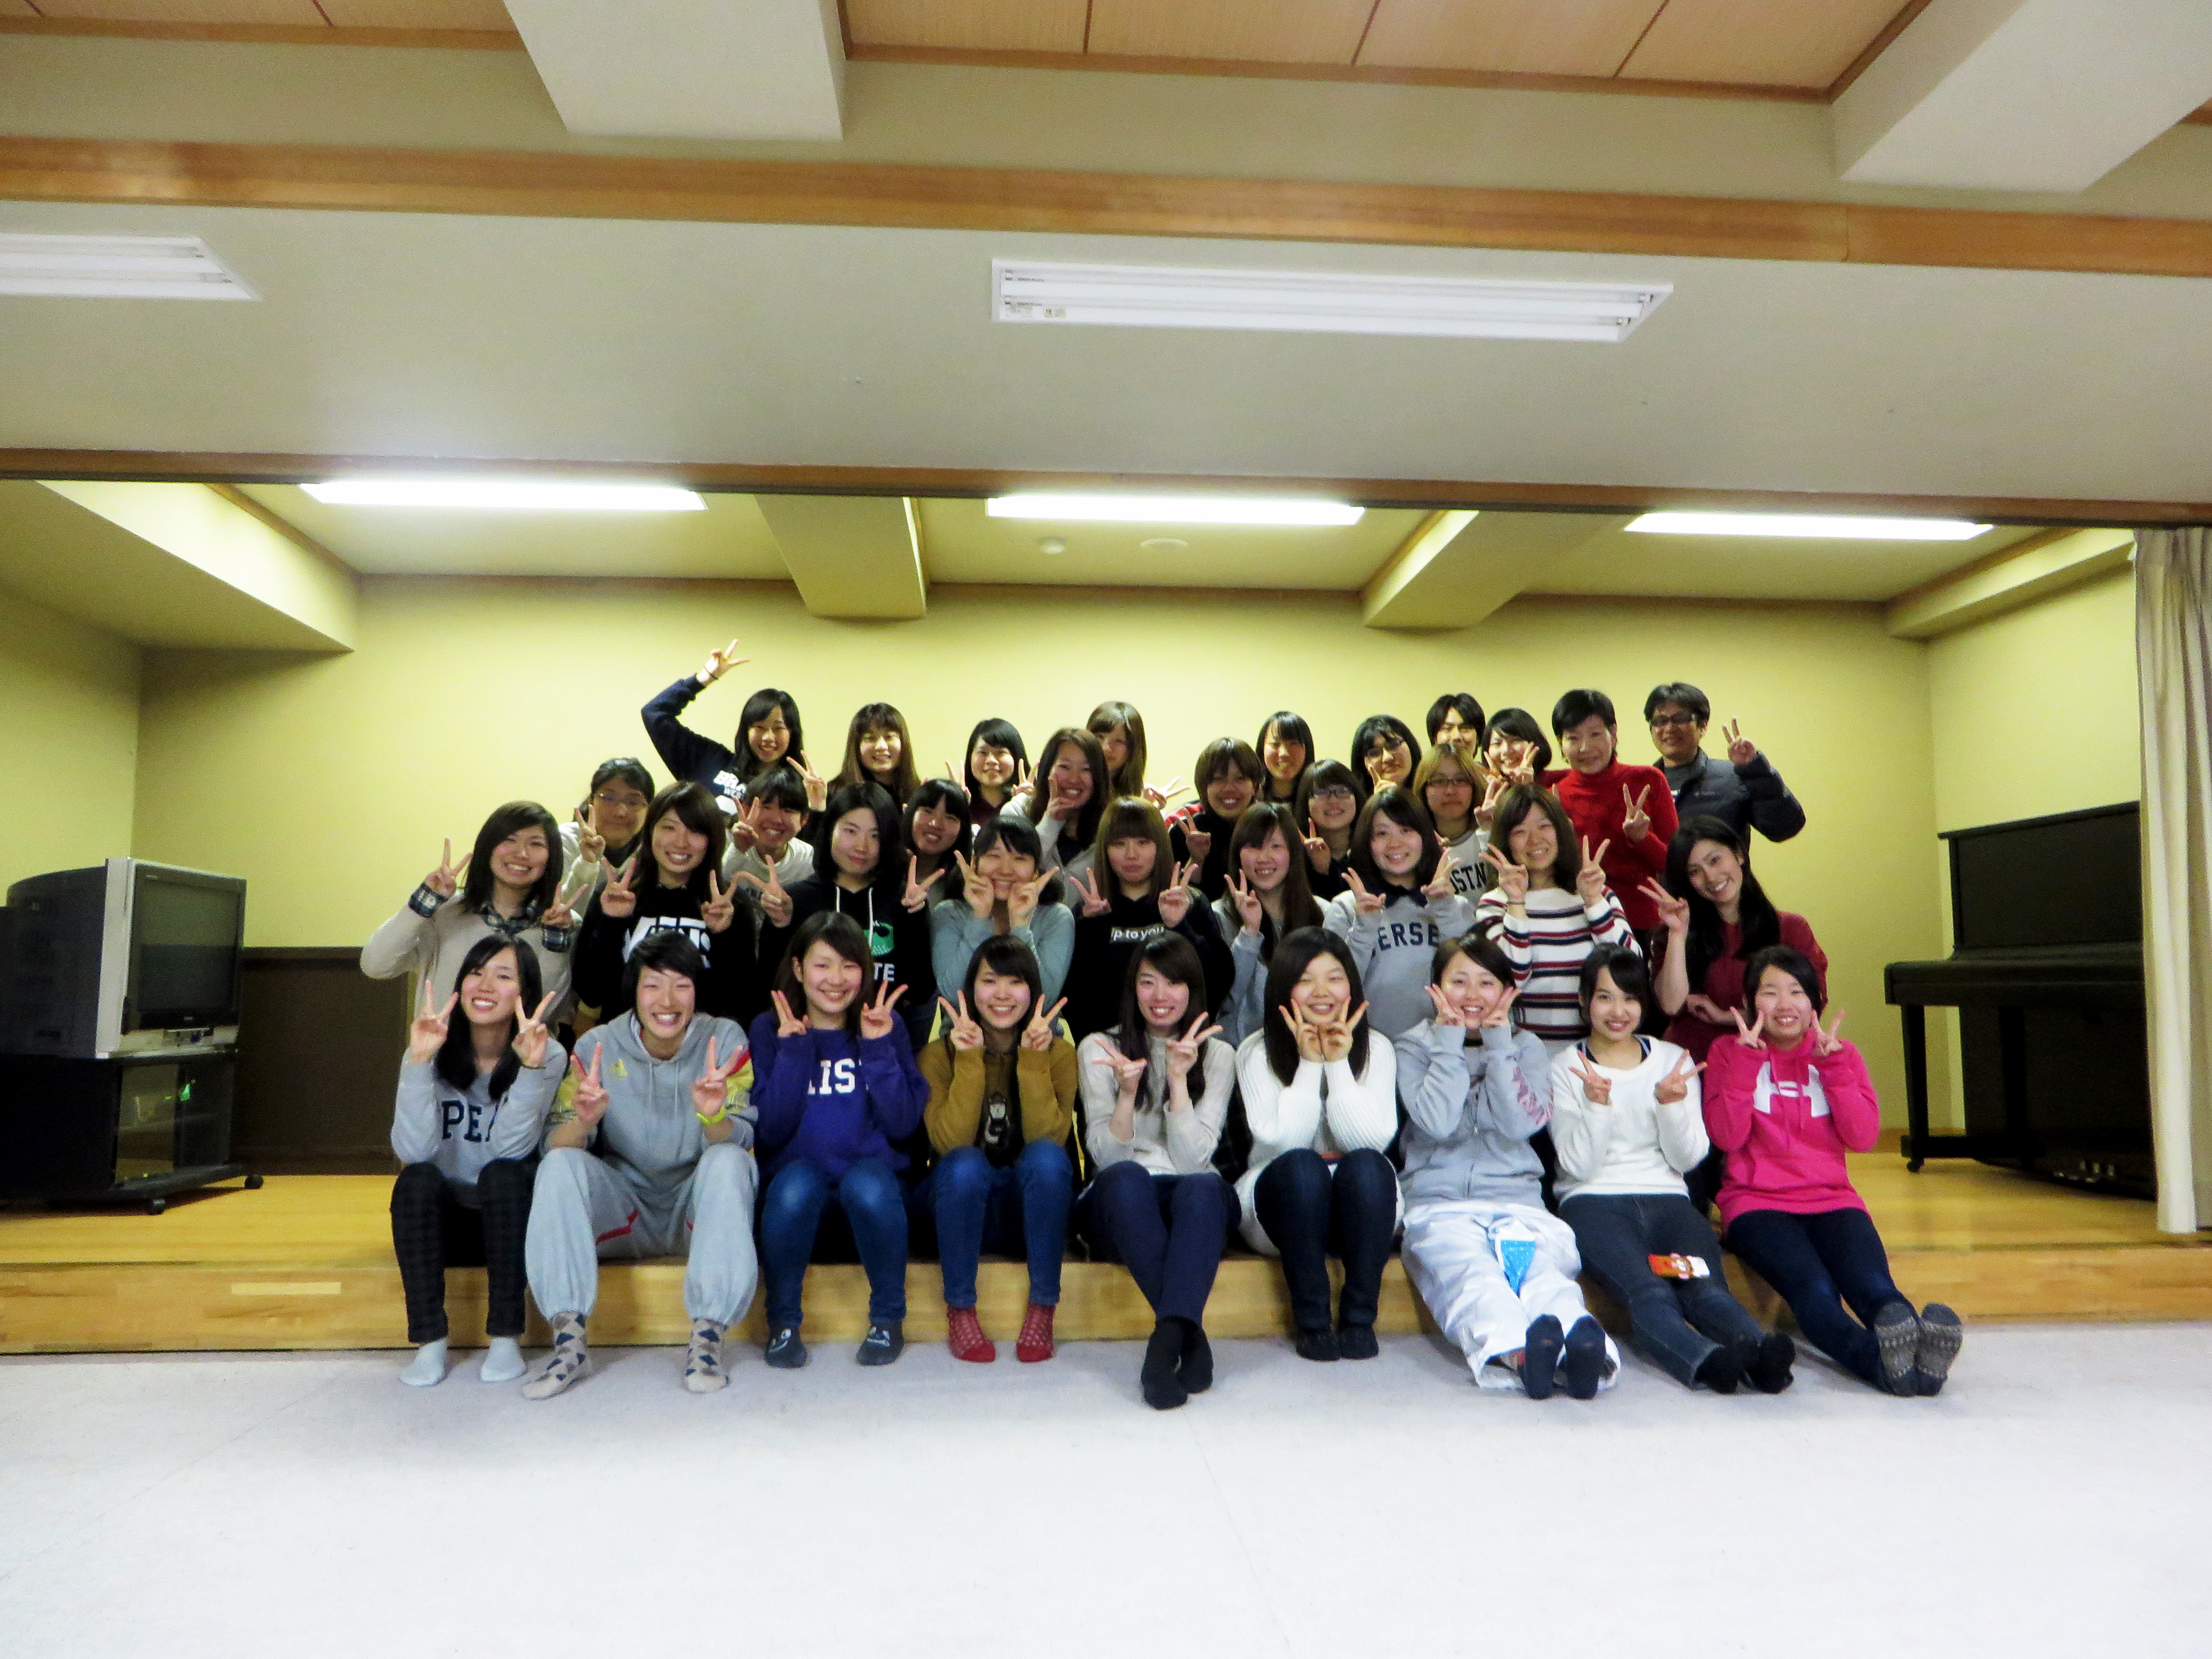 http://www.edusys.jp/mukogawa-u/mukolog/IMG_2212.JPG